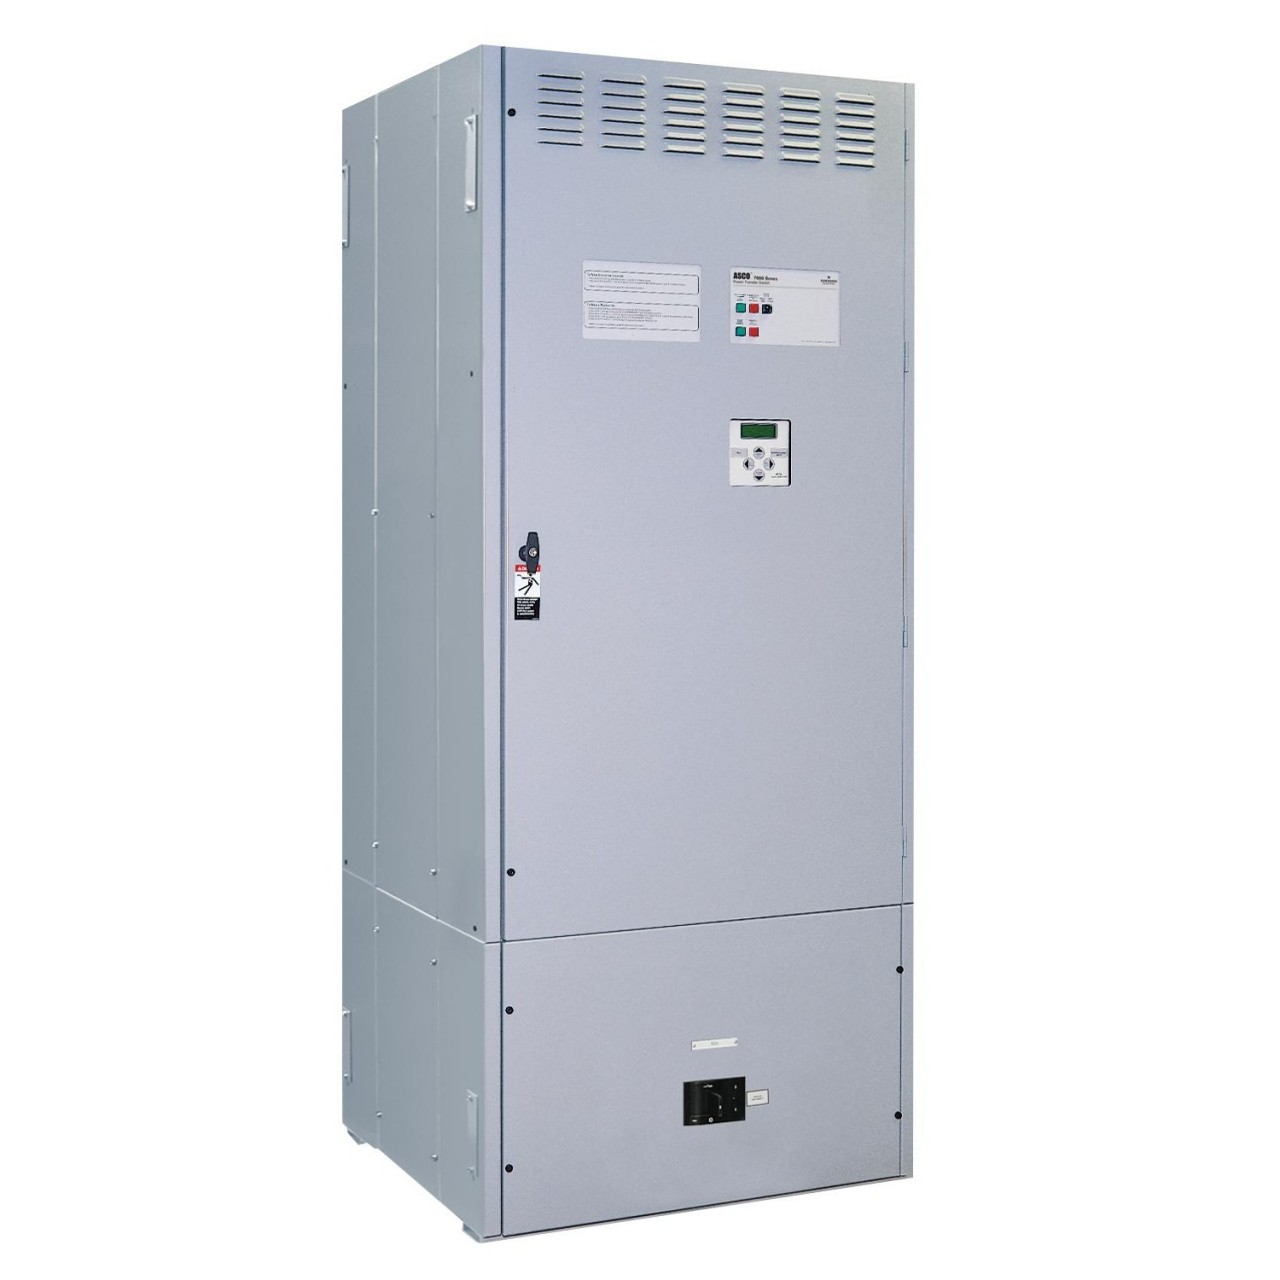 Asco 7000SE Auto Transfer Switch (3Ph, 200A)